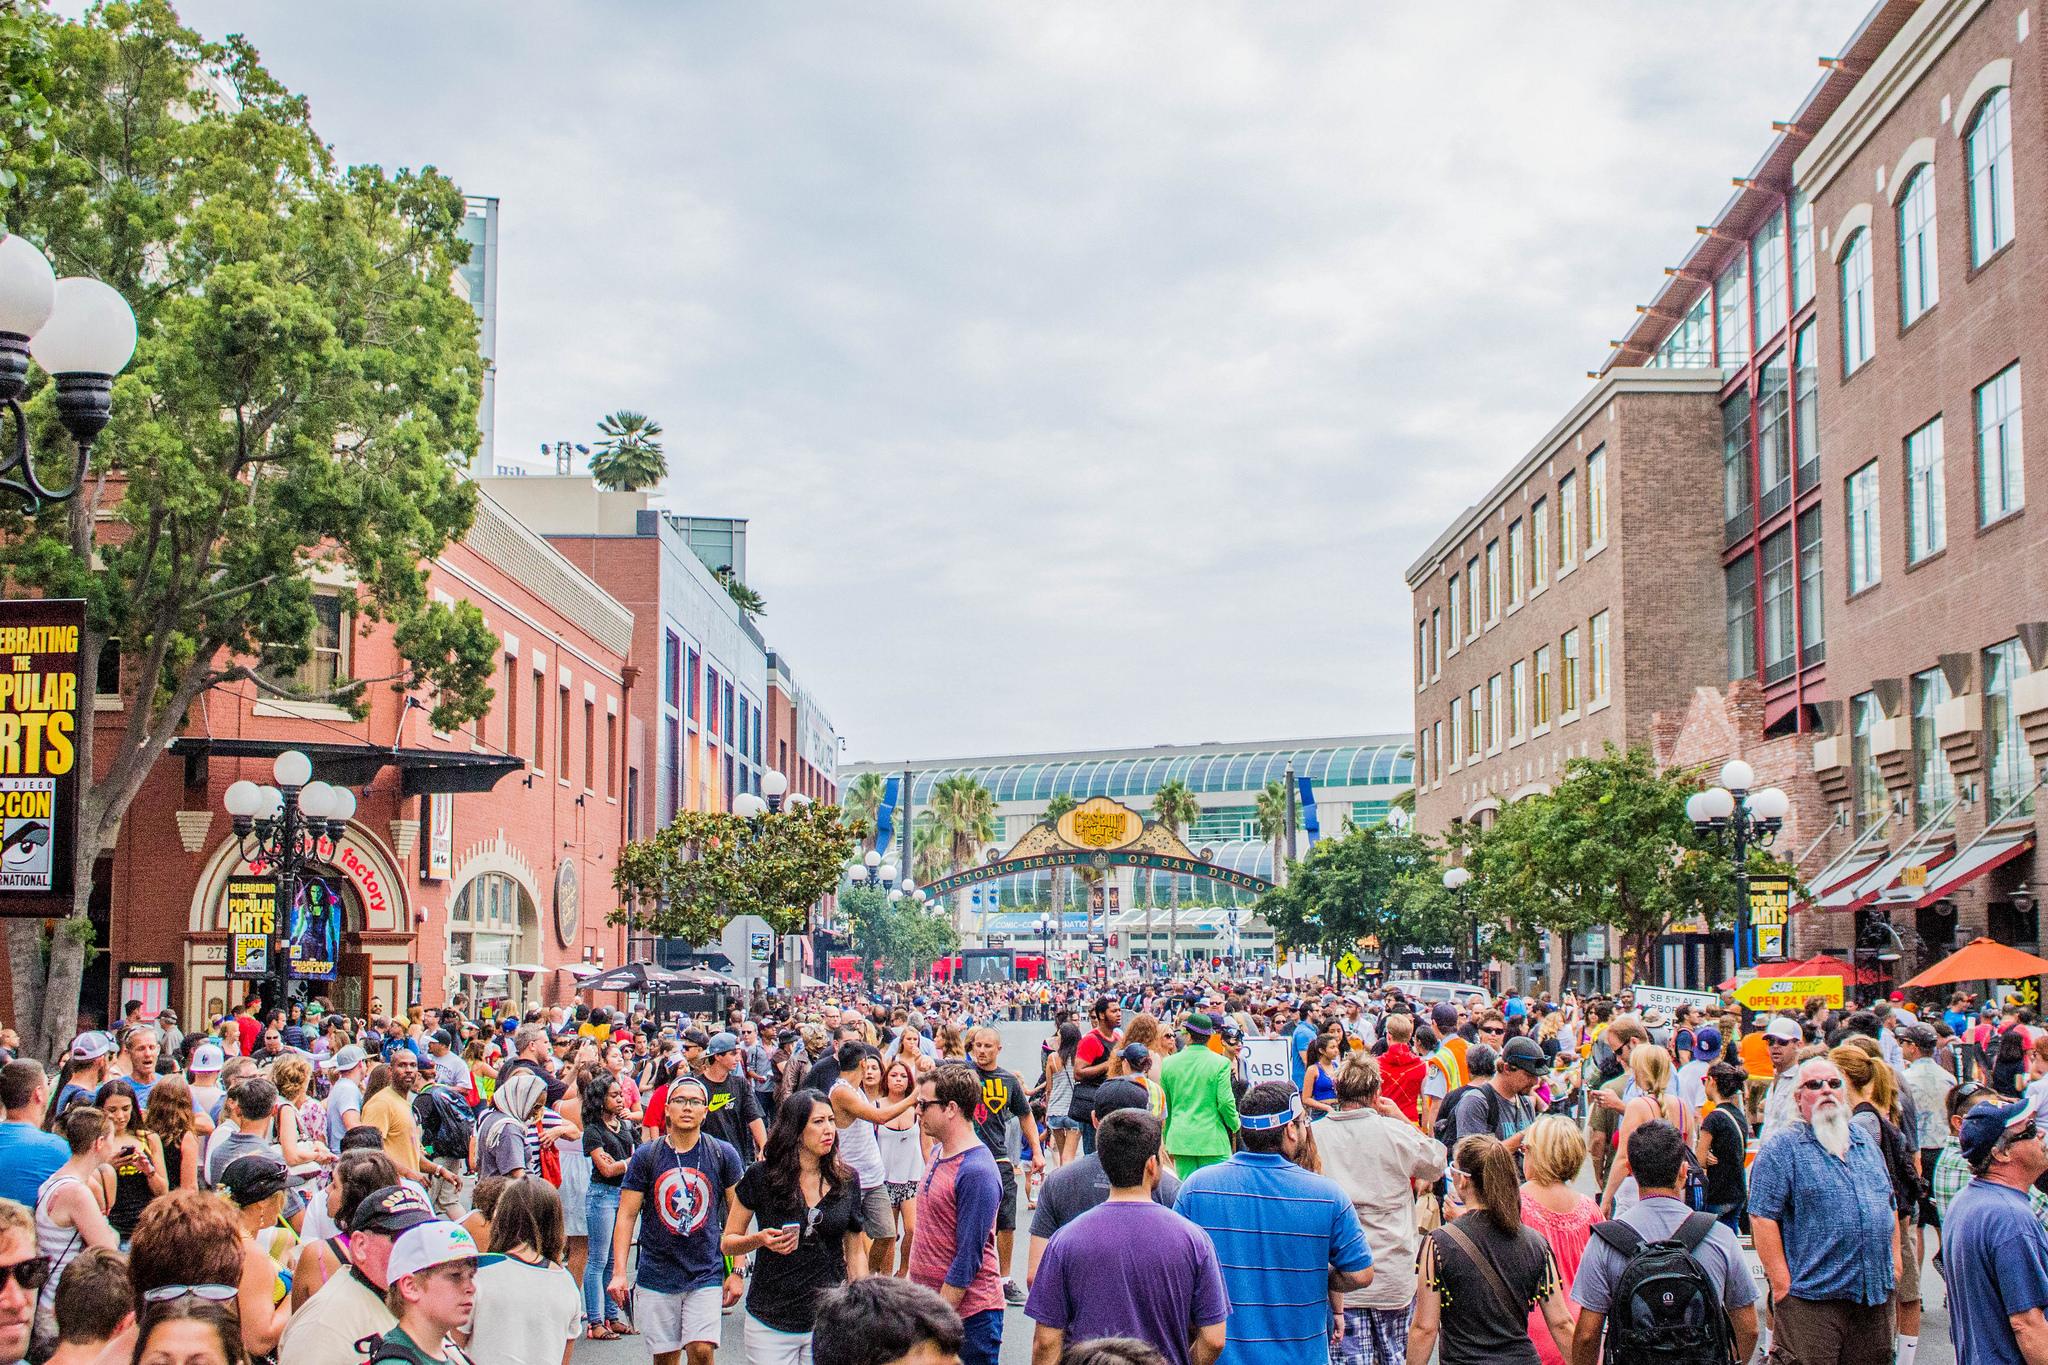 Crowds-at-San-Diego-Comic-Con-2014.jpg